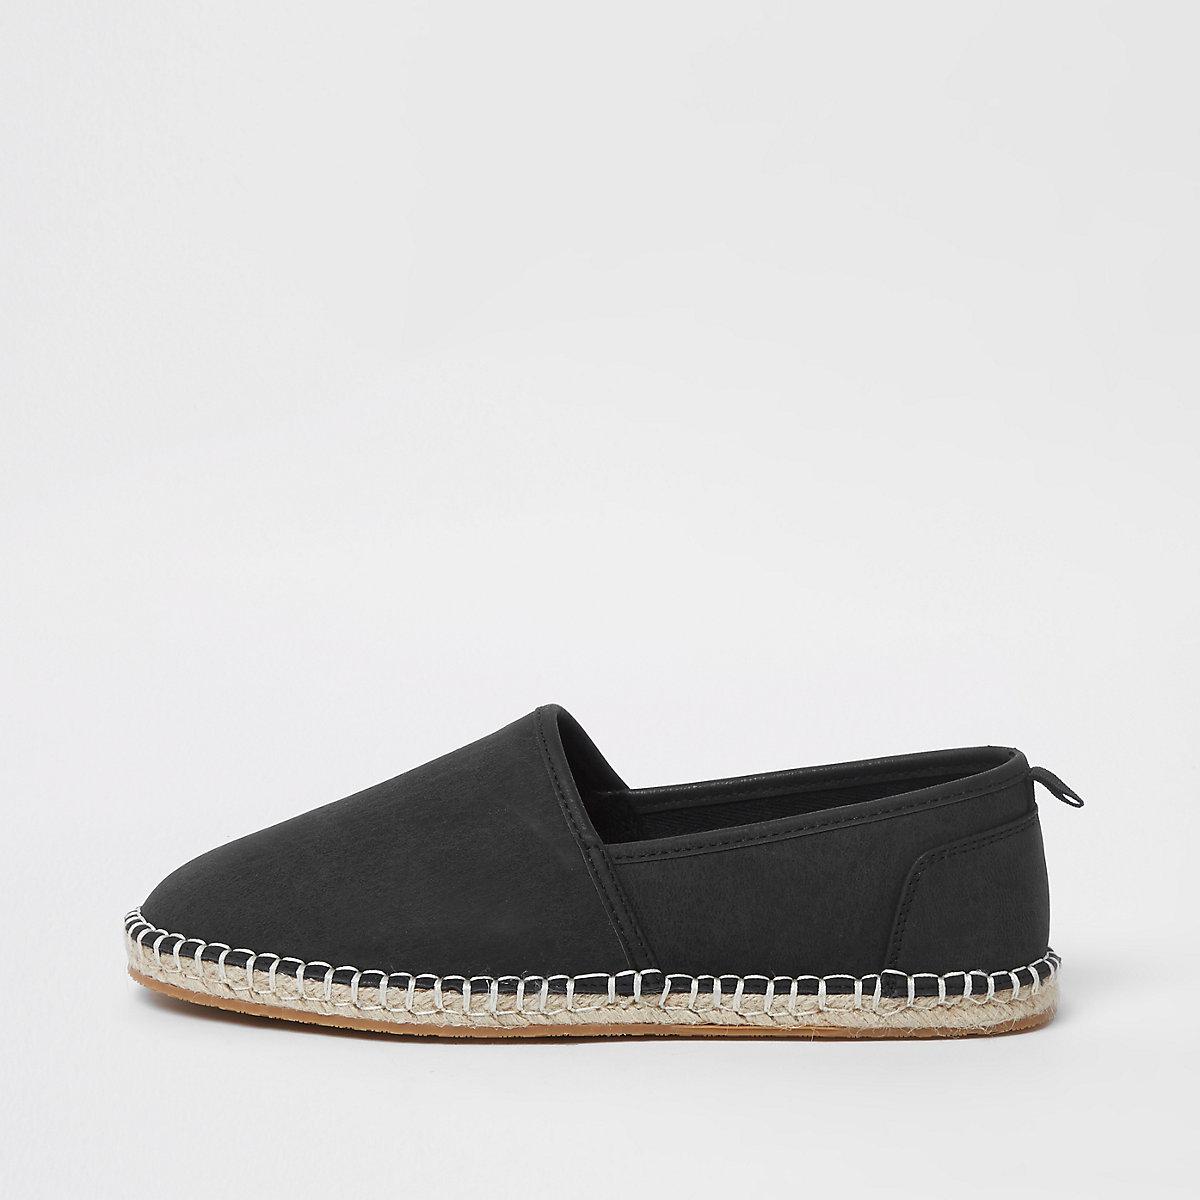 Black slip on espadrilles